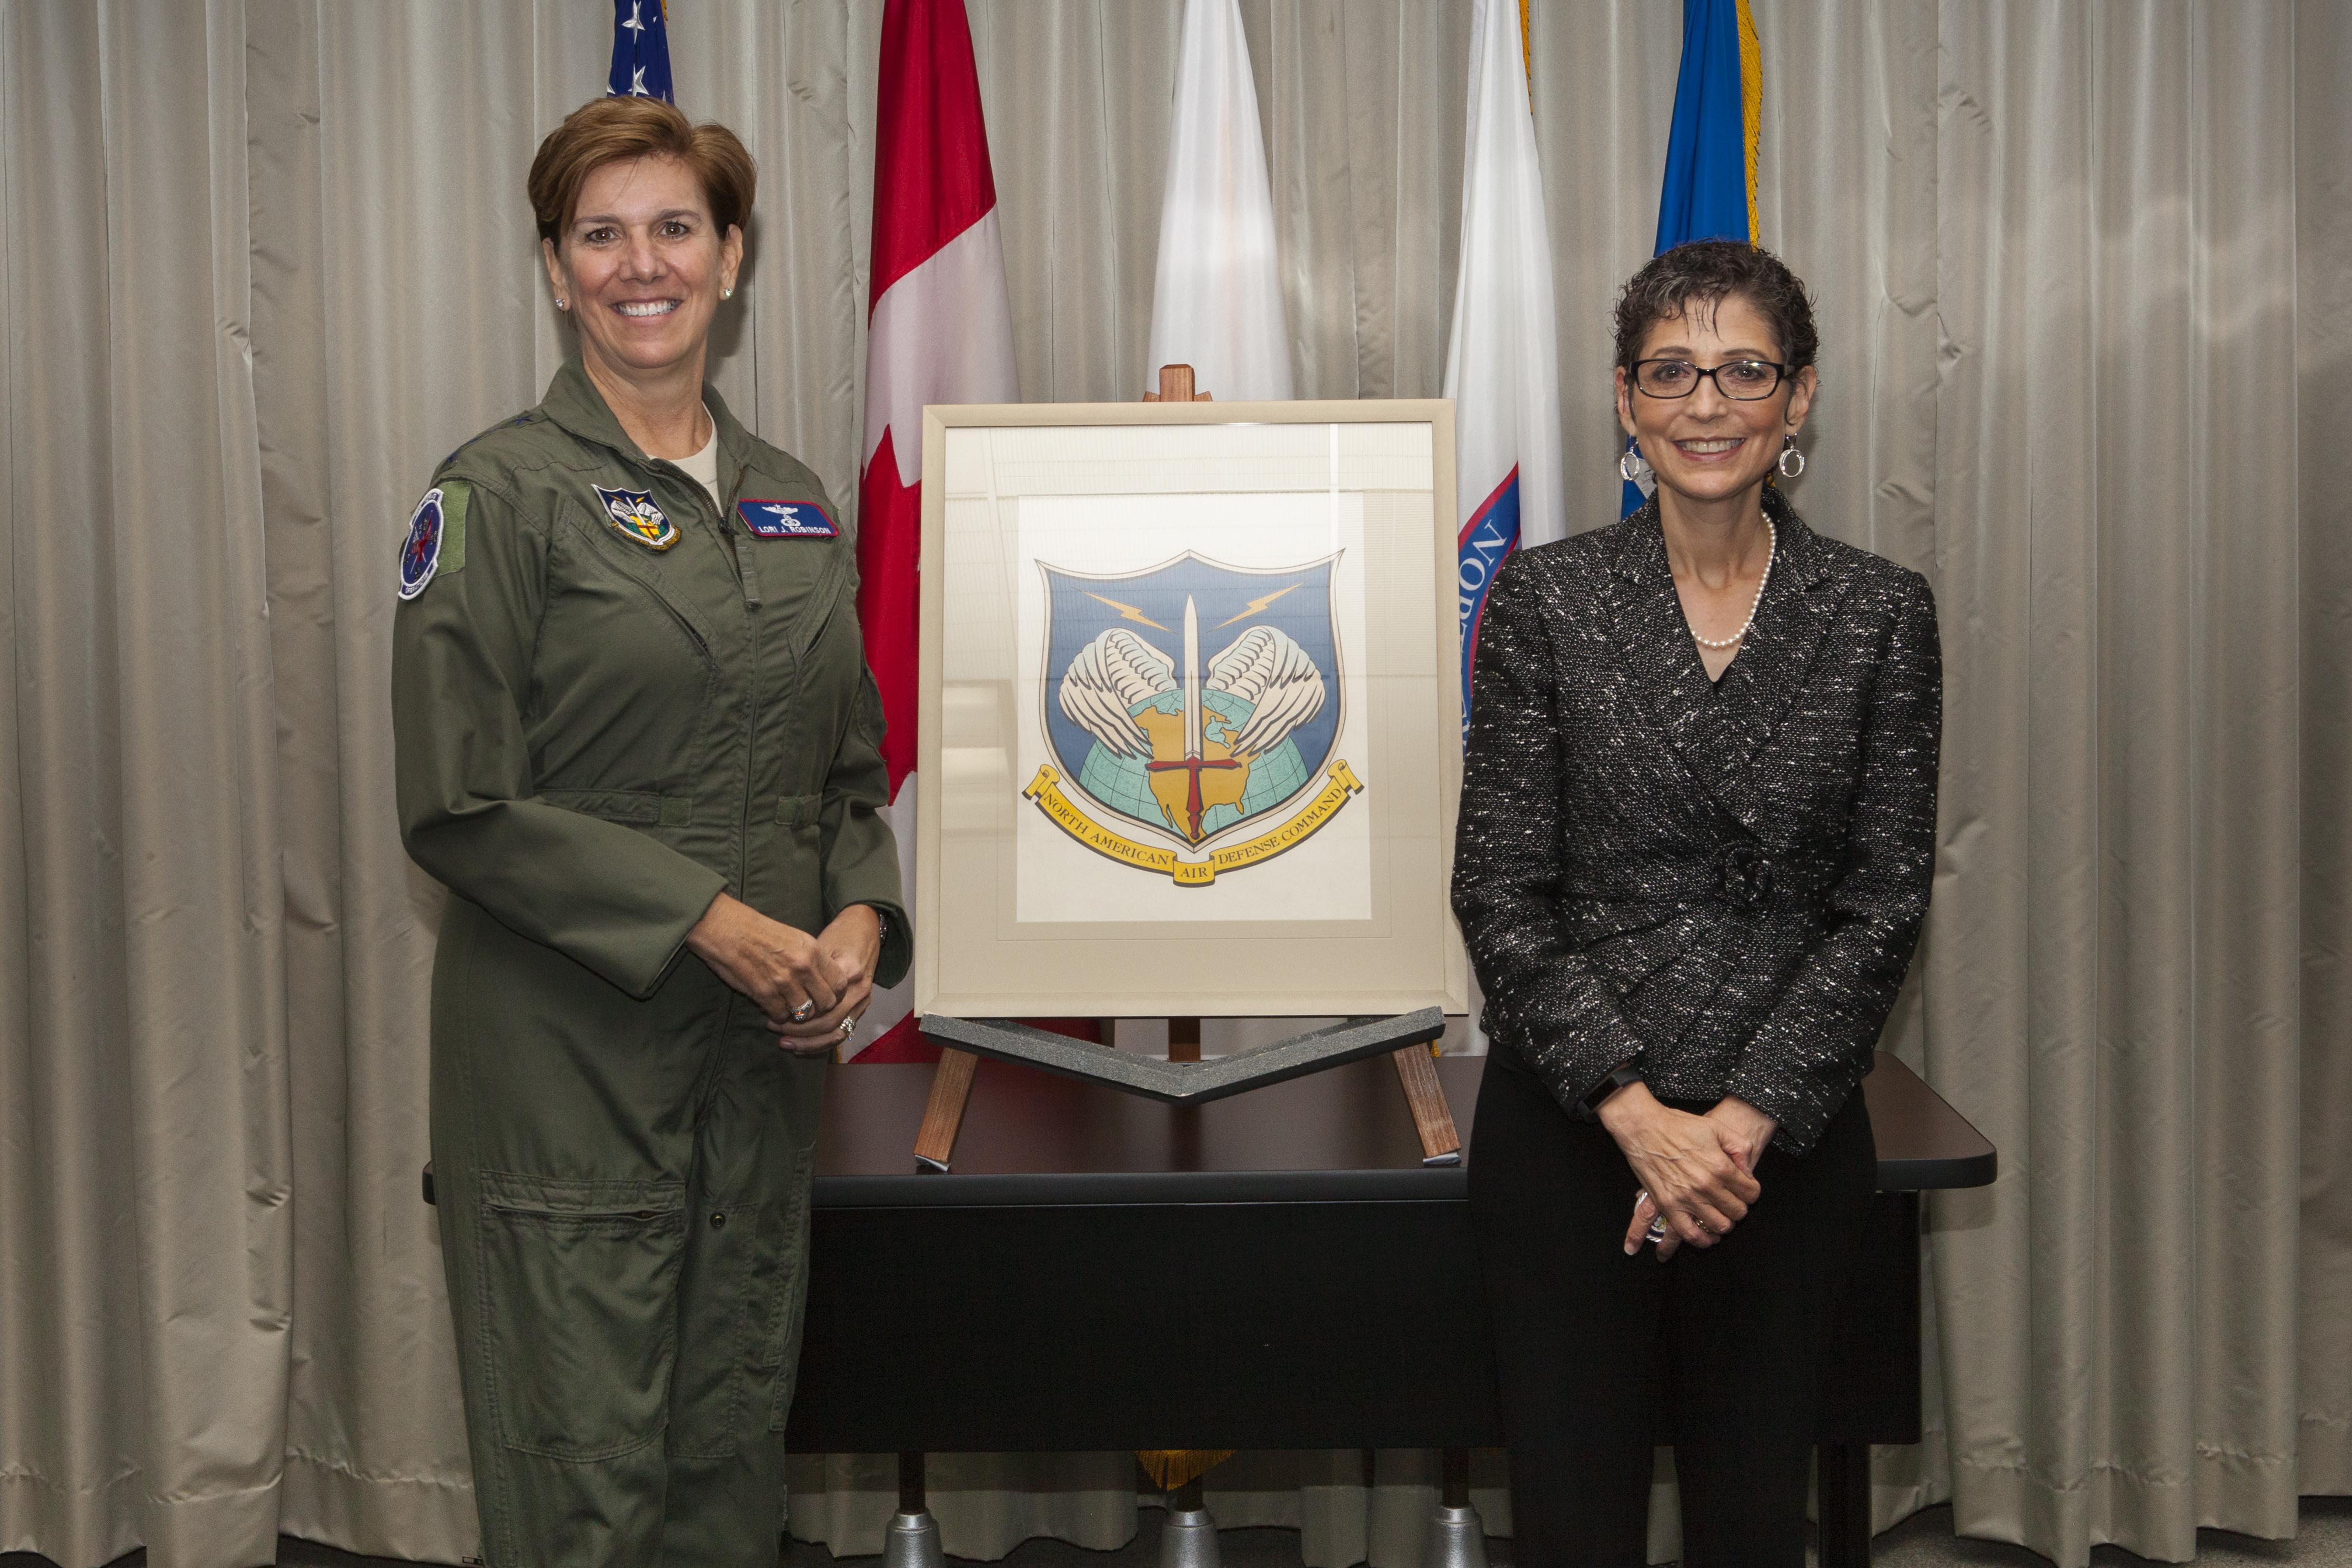 Gen. Robinson and Ms. Mona Rowe pose with original NORAD emblem art